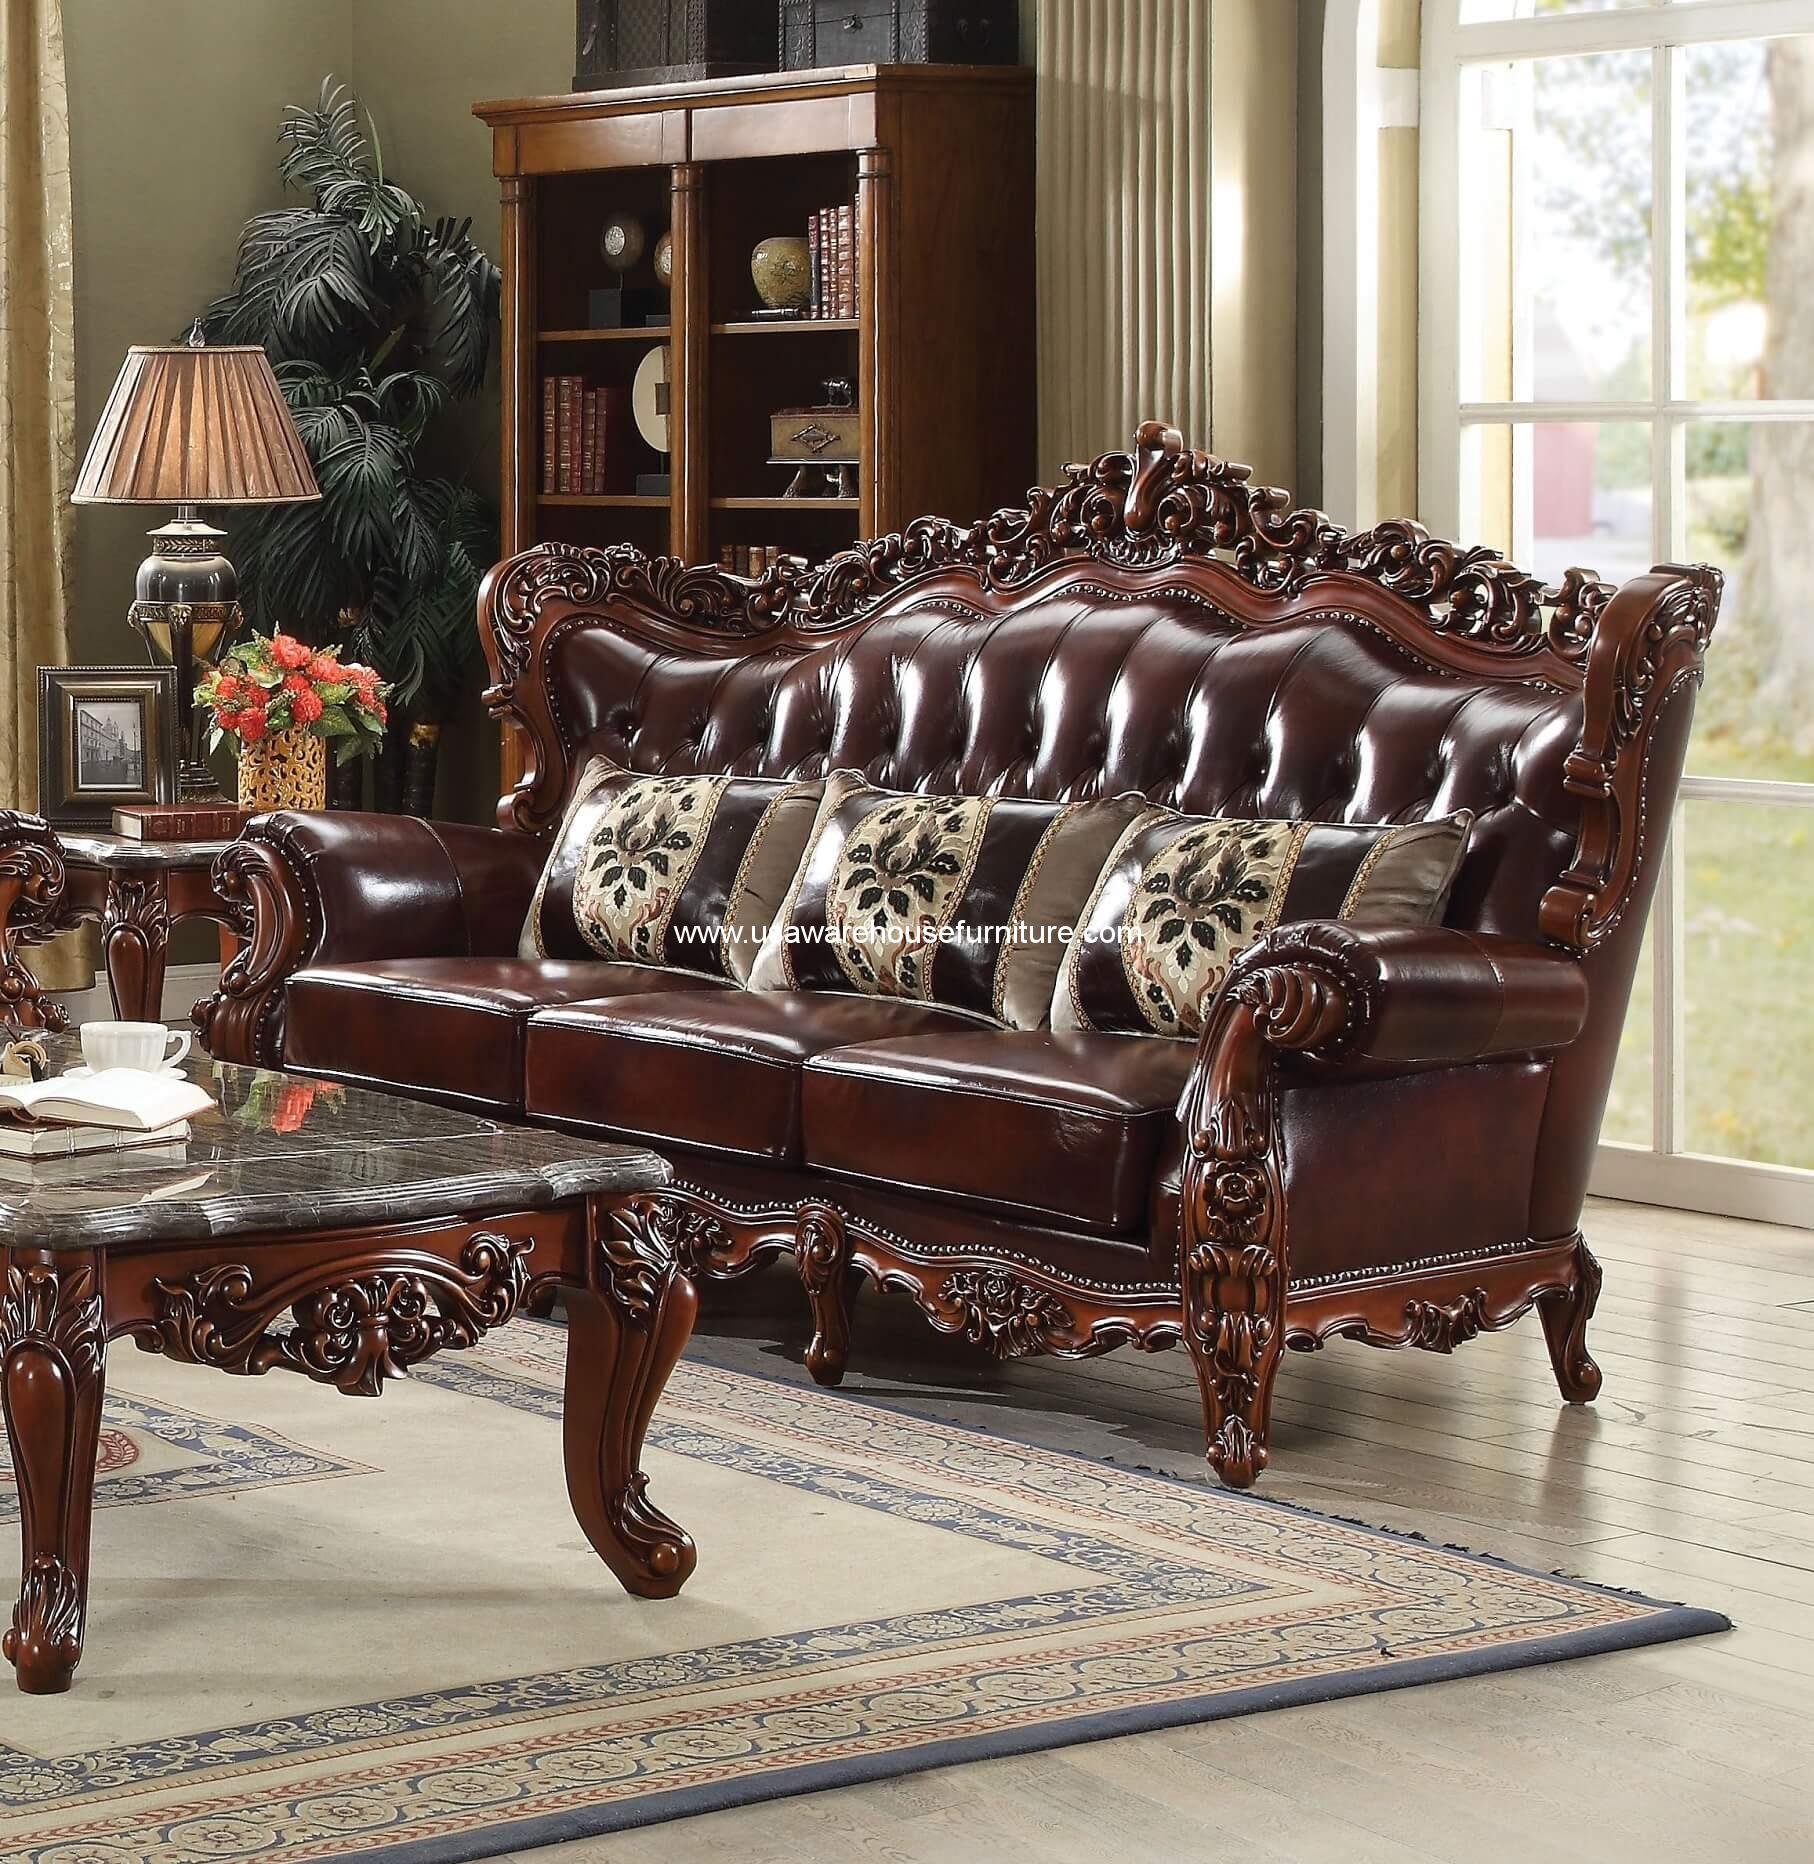 Eustoma Wood Trim Top Grain Leather Sofa 53065 Usa Warehouse Furniture